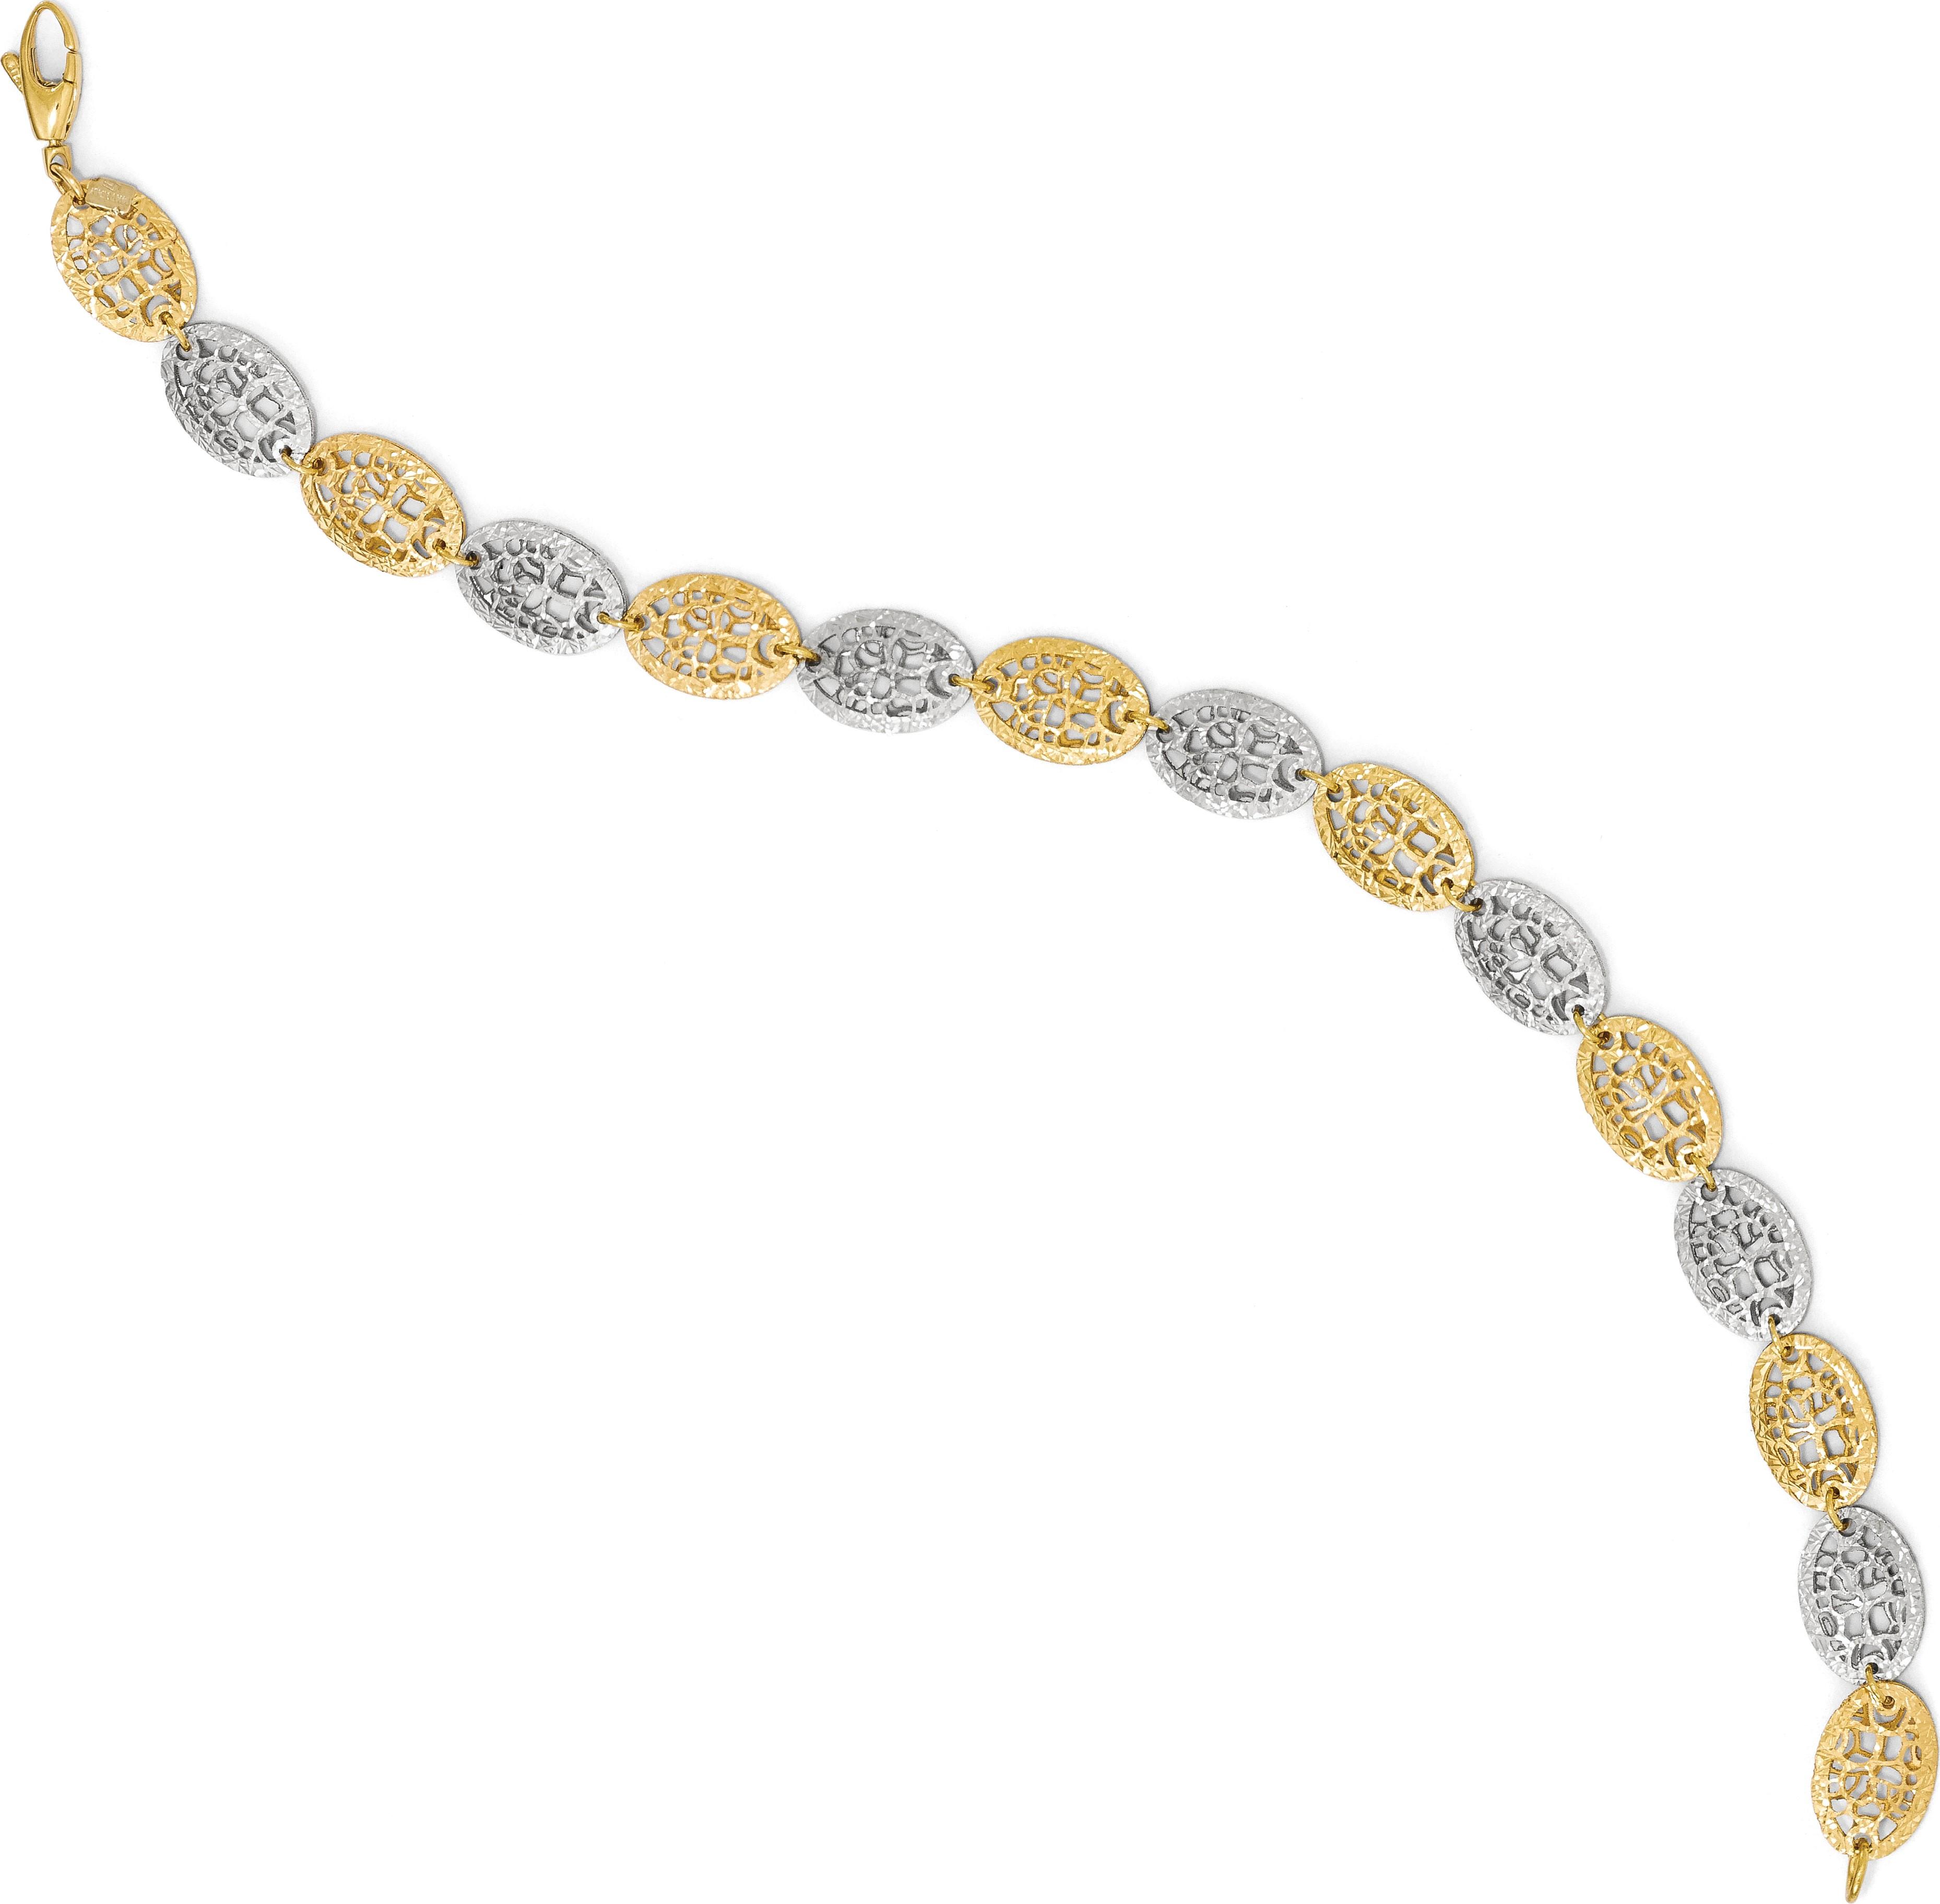 14k Two-tone Leslies Two-tone Fancy Bracelet - image 1 of 4